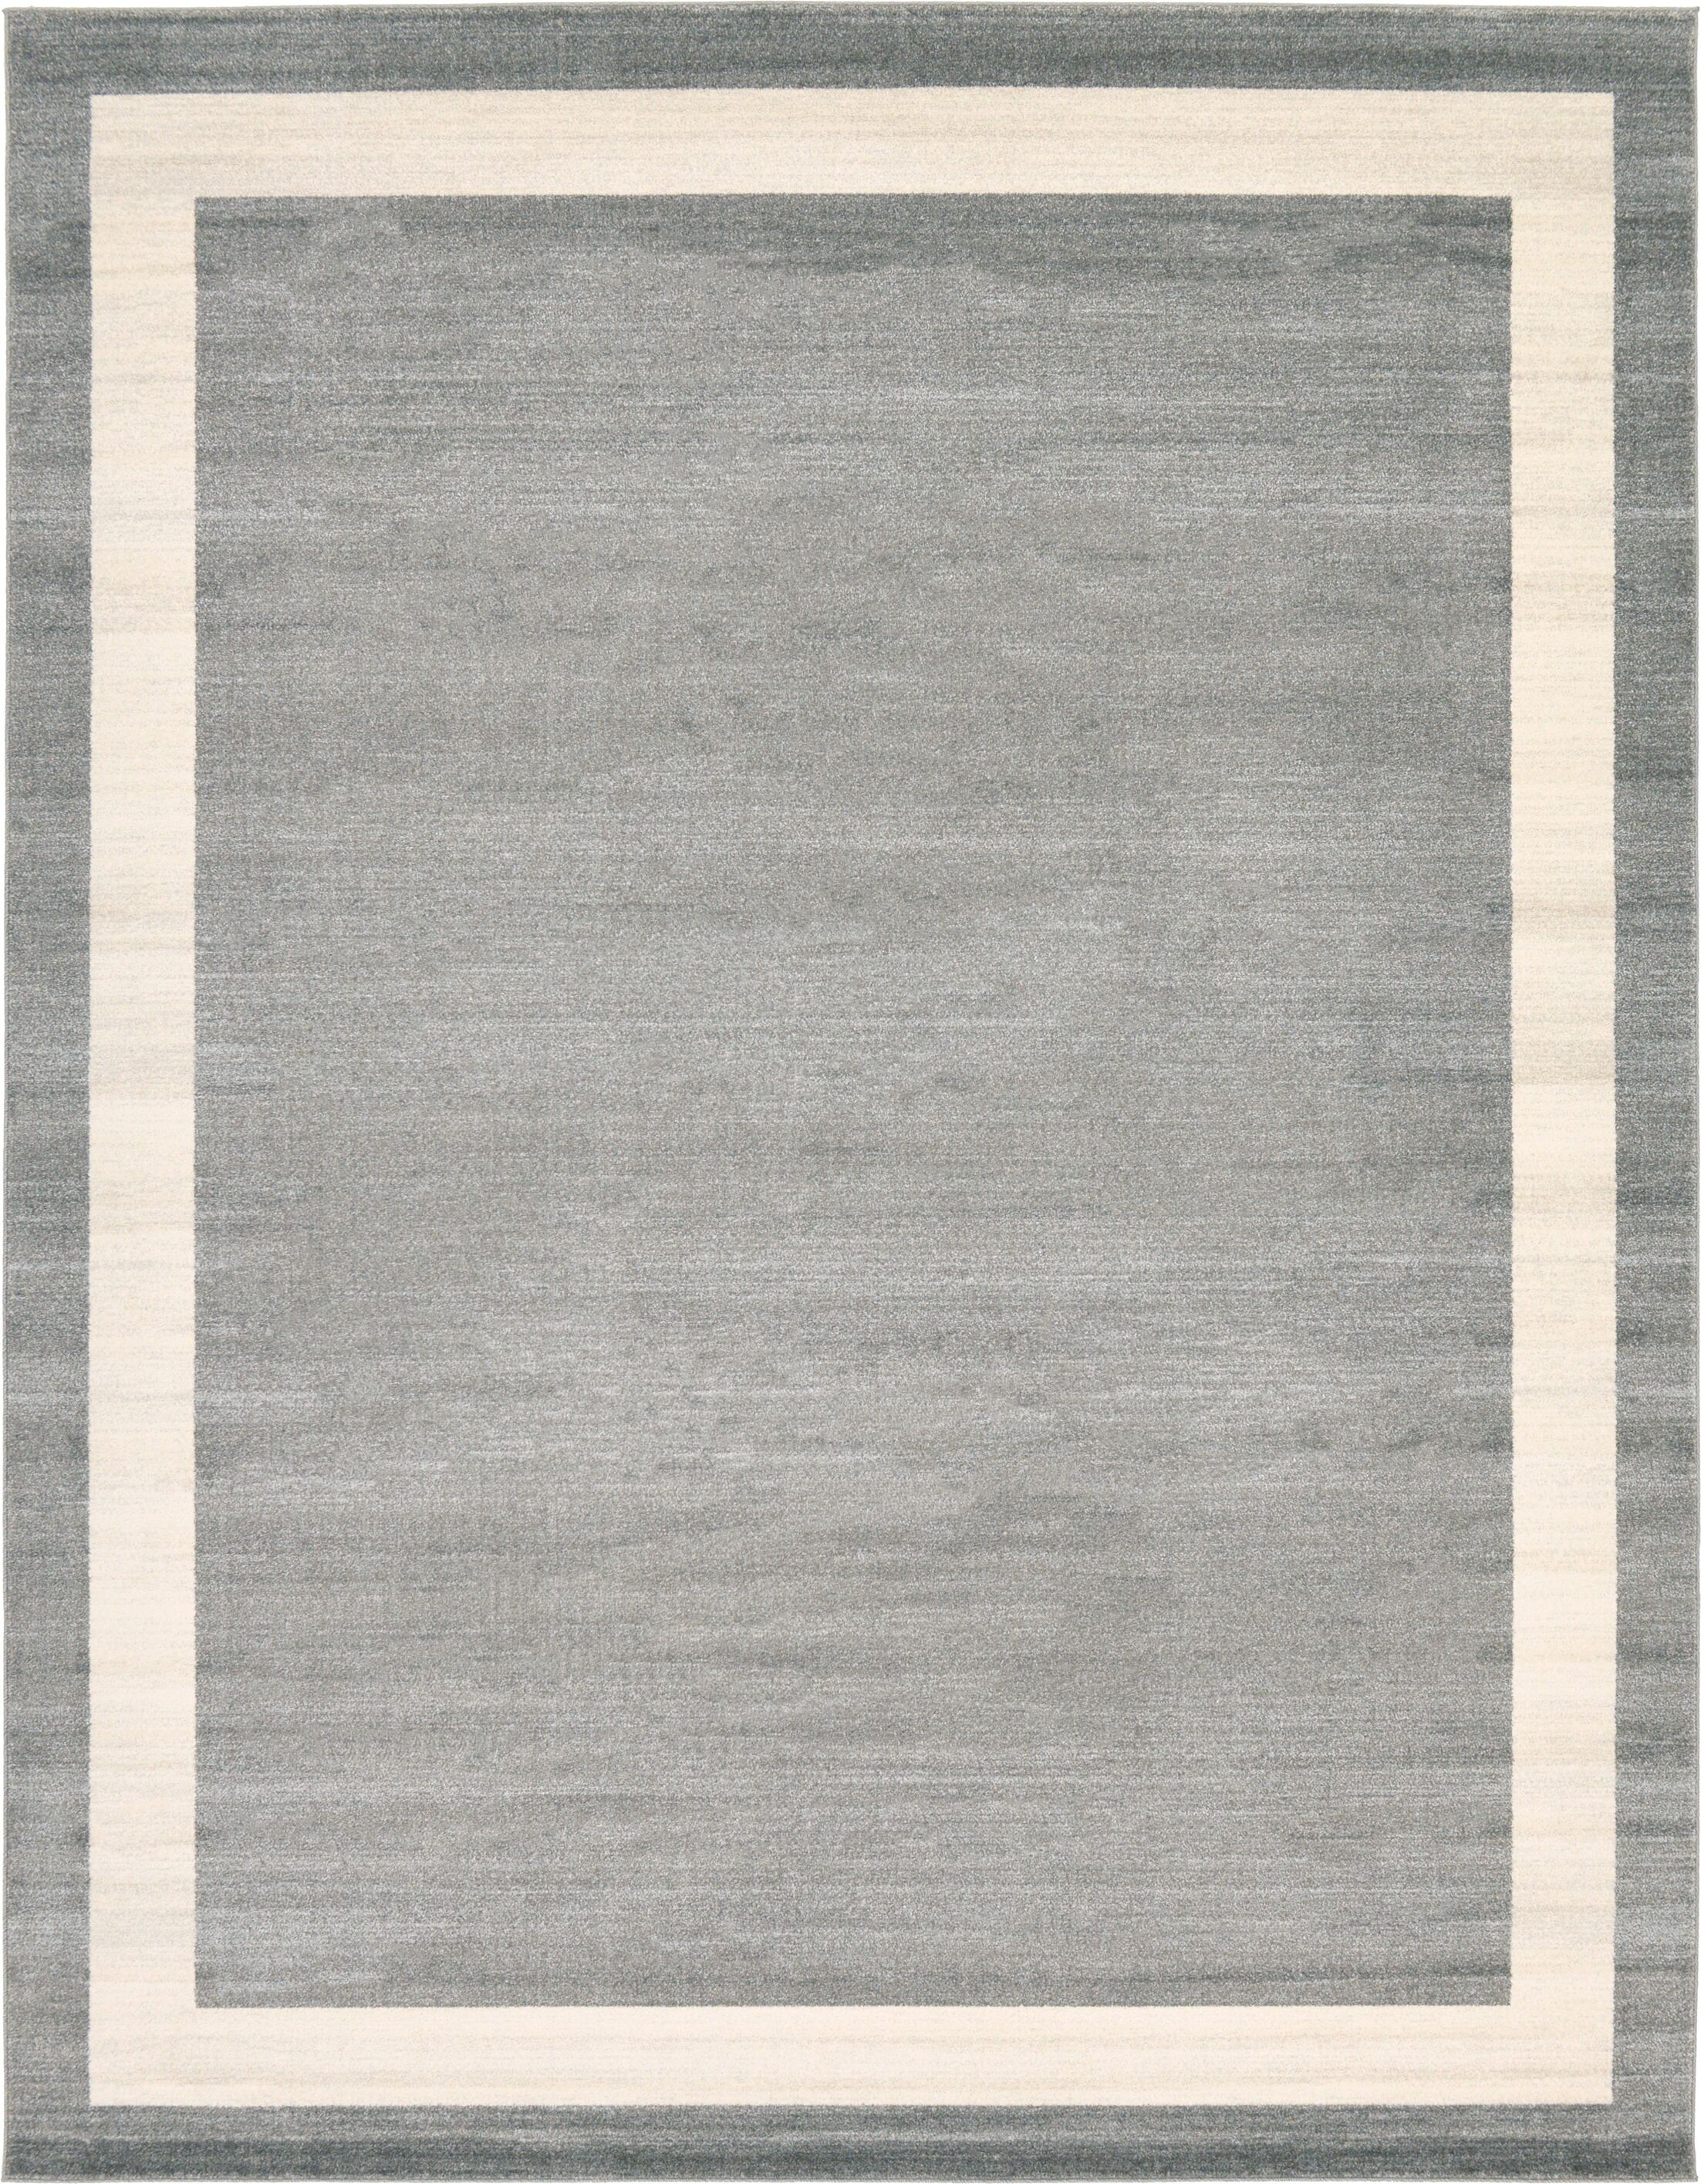 Mischa Gray Area Rug Rug Size: 10' x 13'